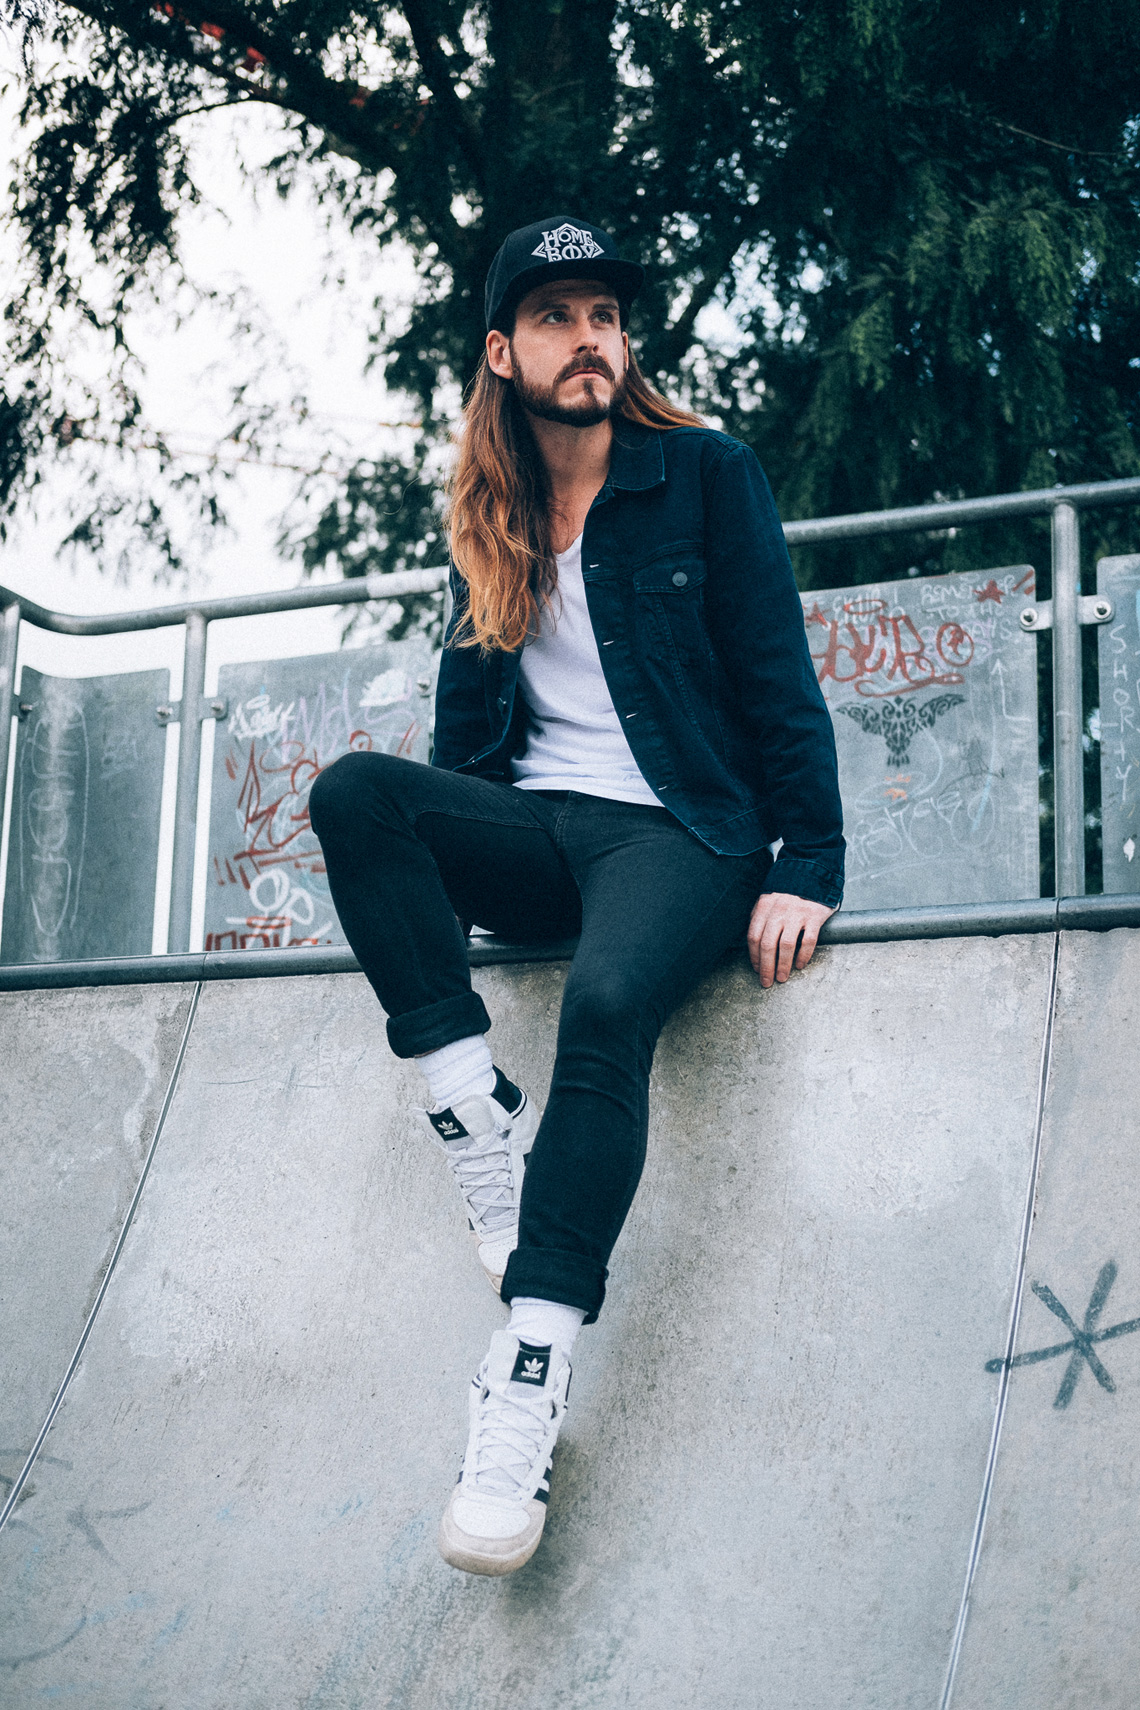 Kaisers-neue-Kleider-Männermodeblog-90ies-Jeans-Look-Homeboy-adidas-Denim-Skater